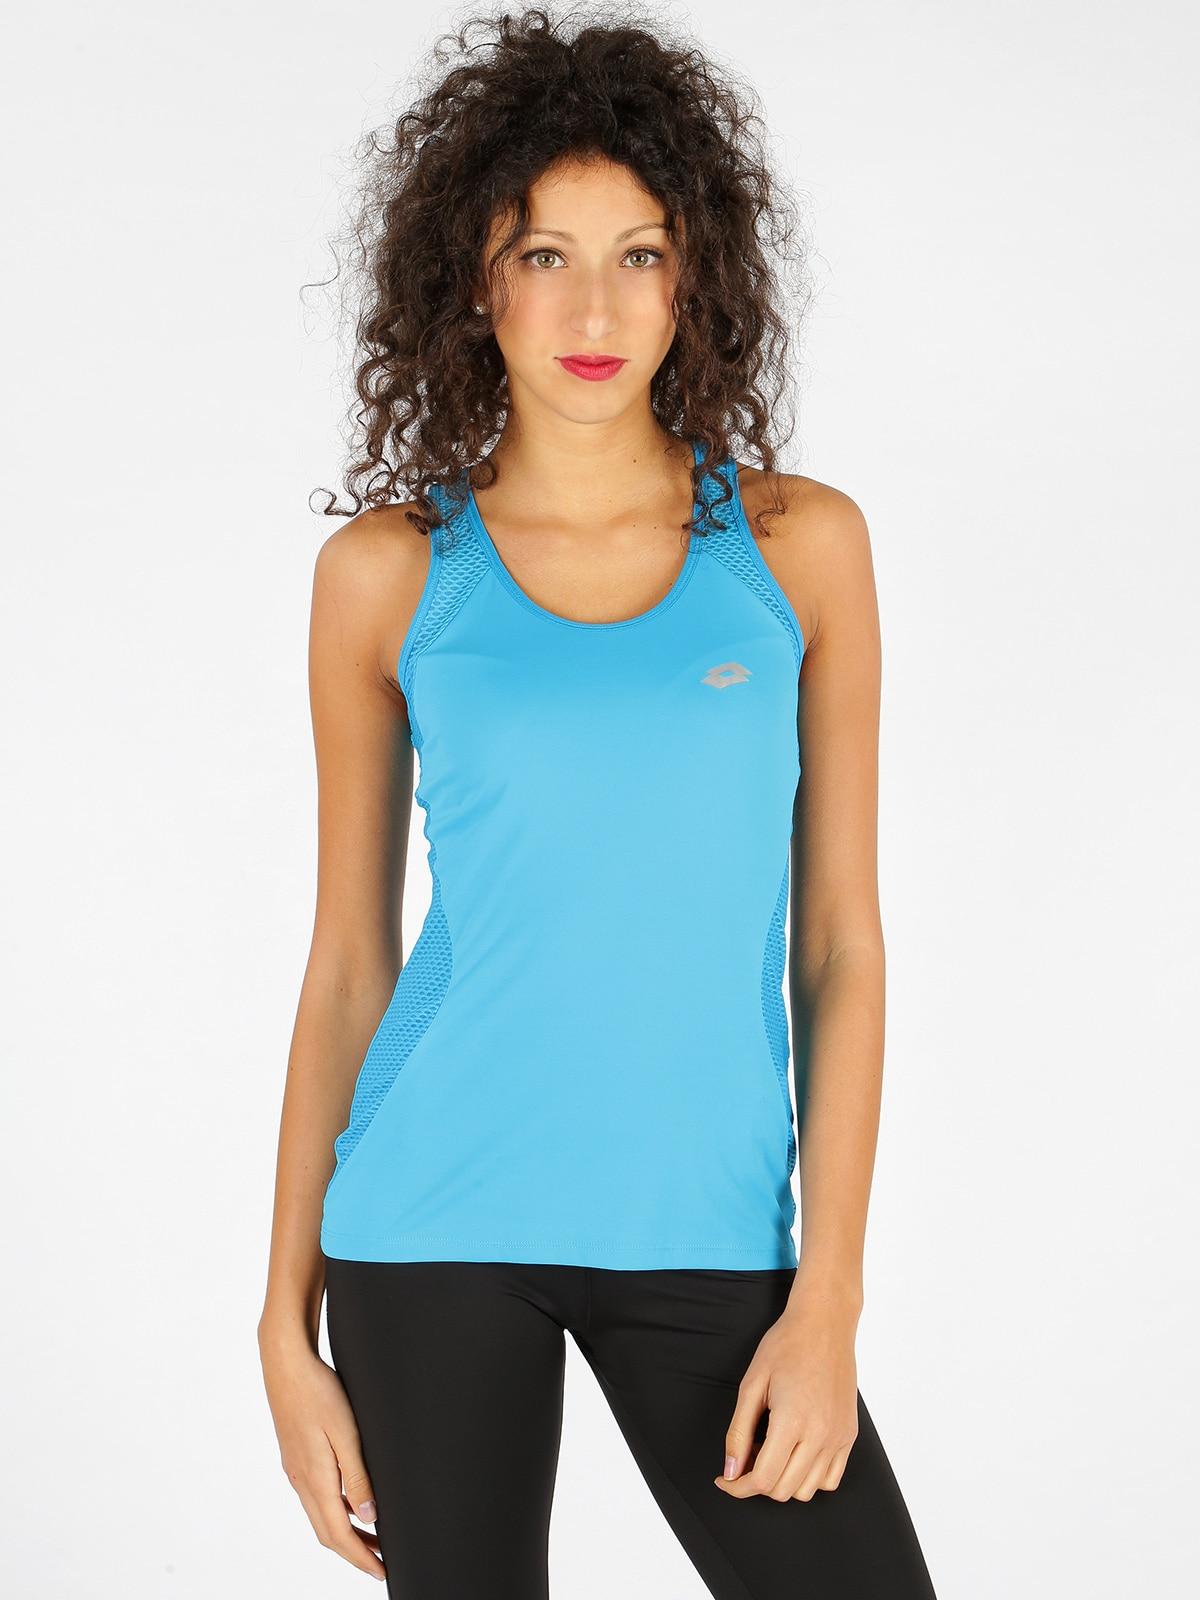 Ursula VI tanque PL W-Camiseta deportiva azul